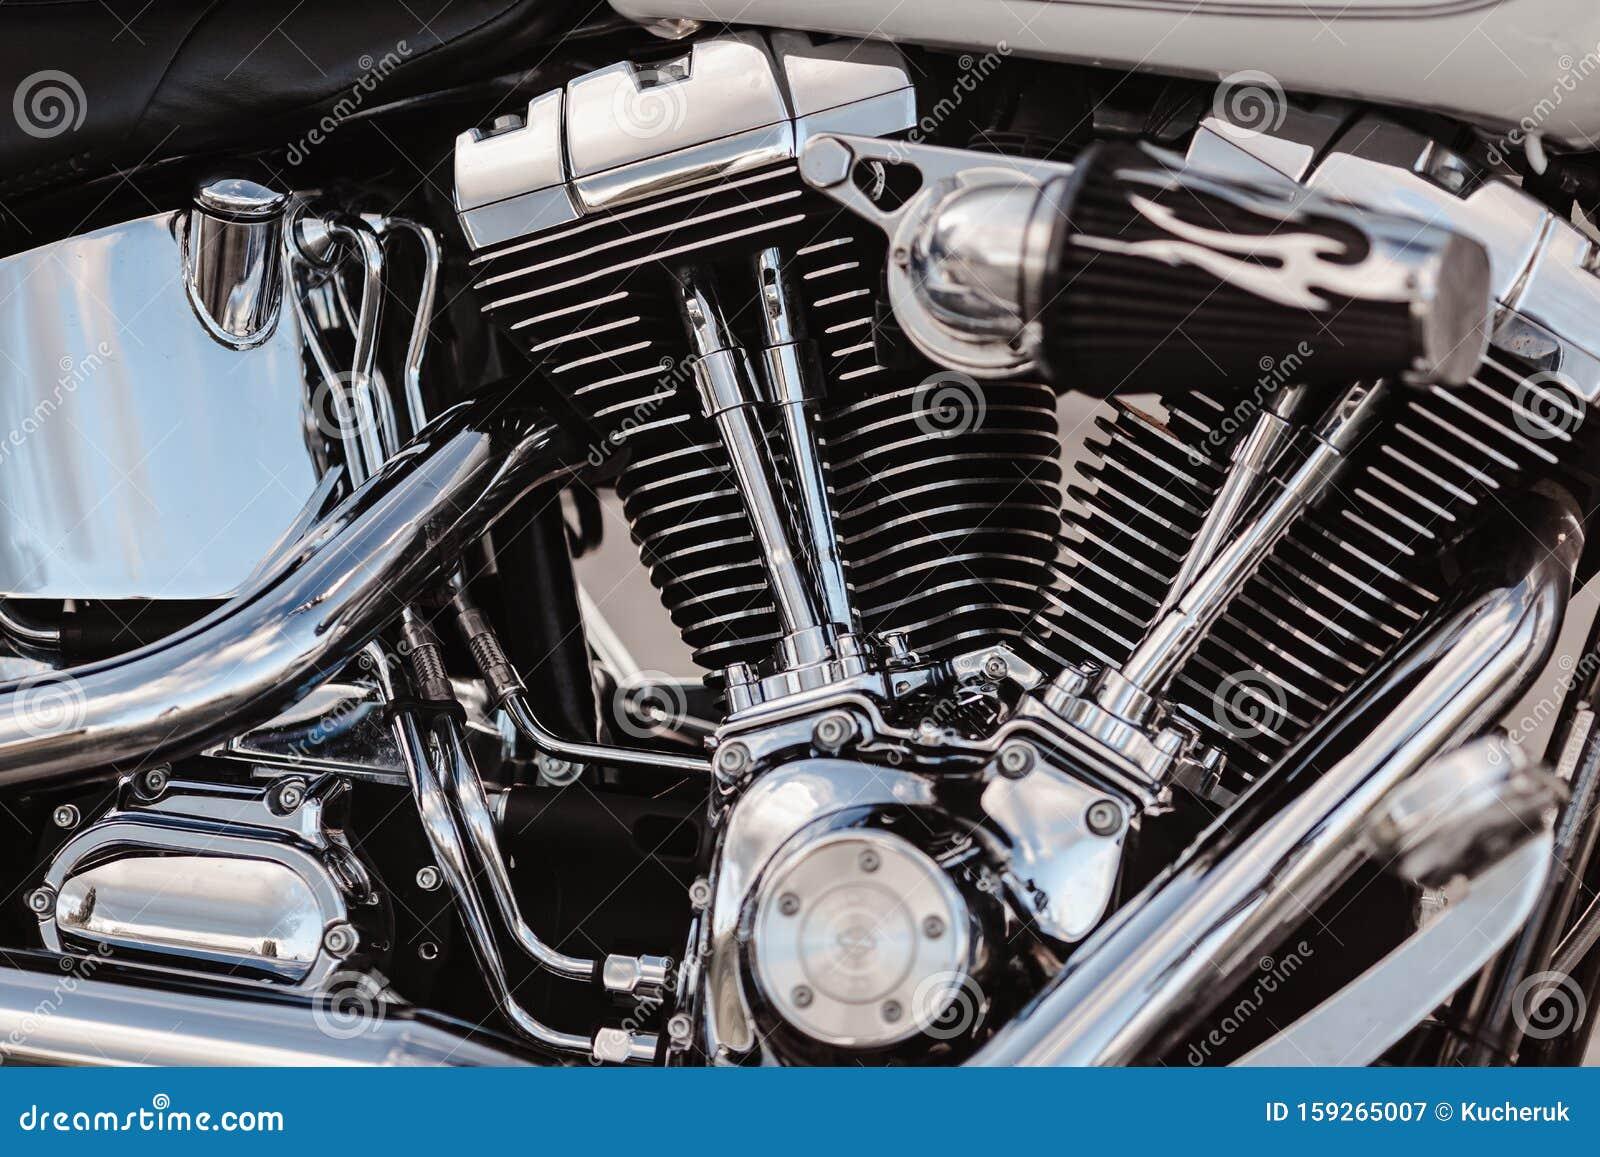 Rivne Ukraine September 23 2019 Harley Davidson Fat Boy